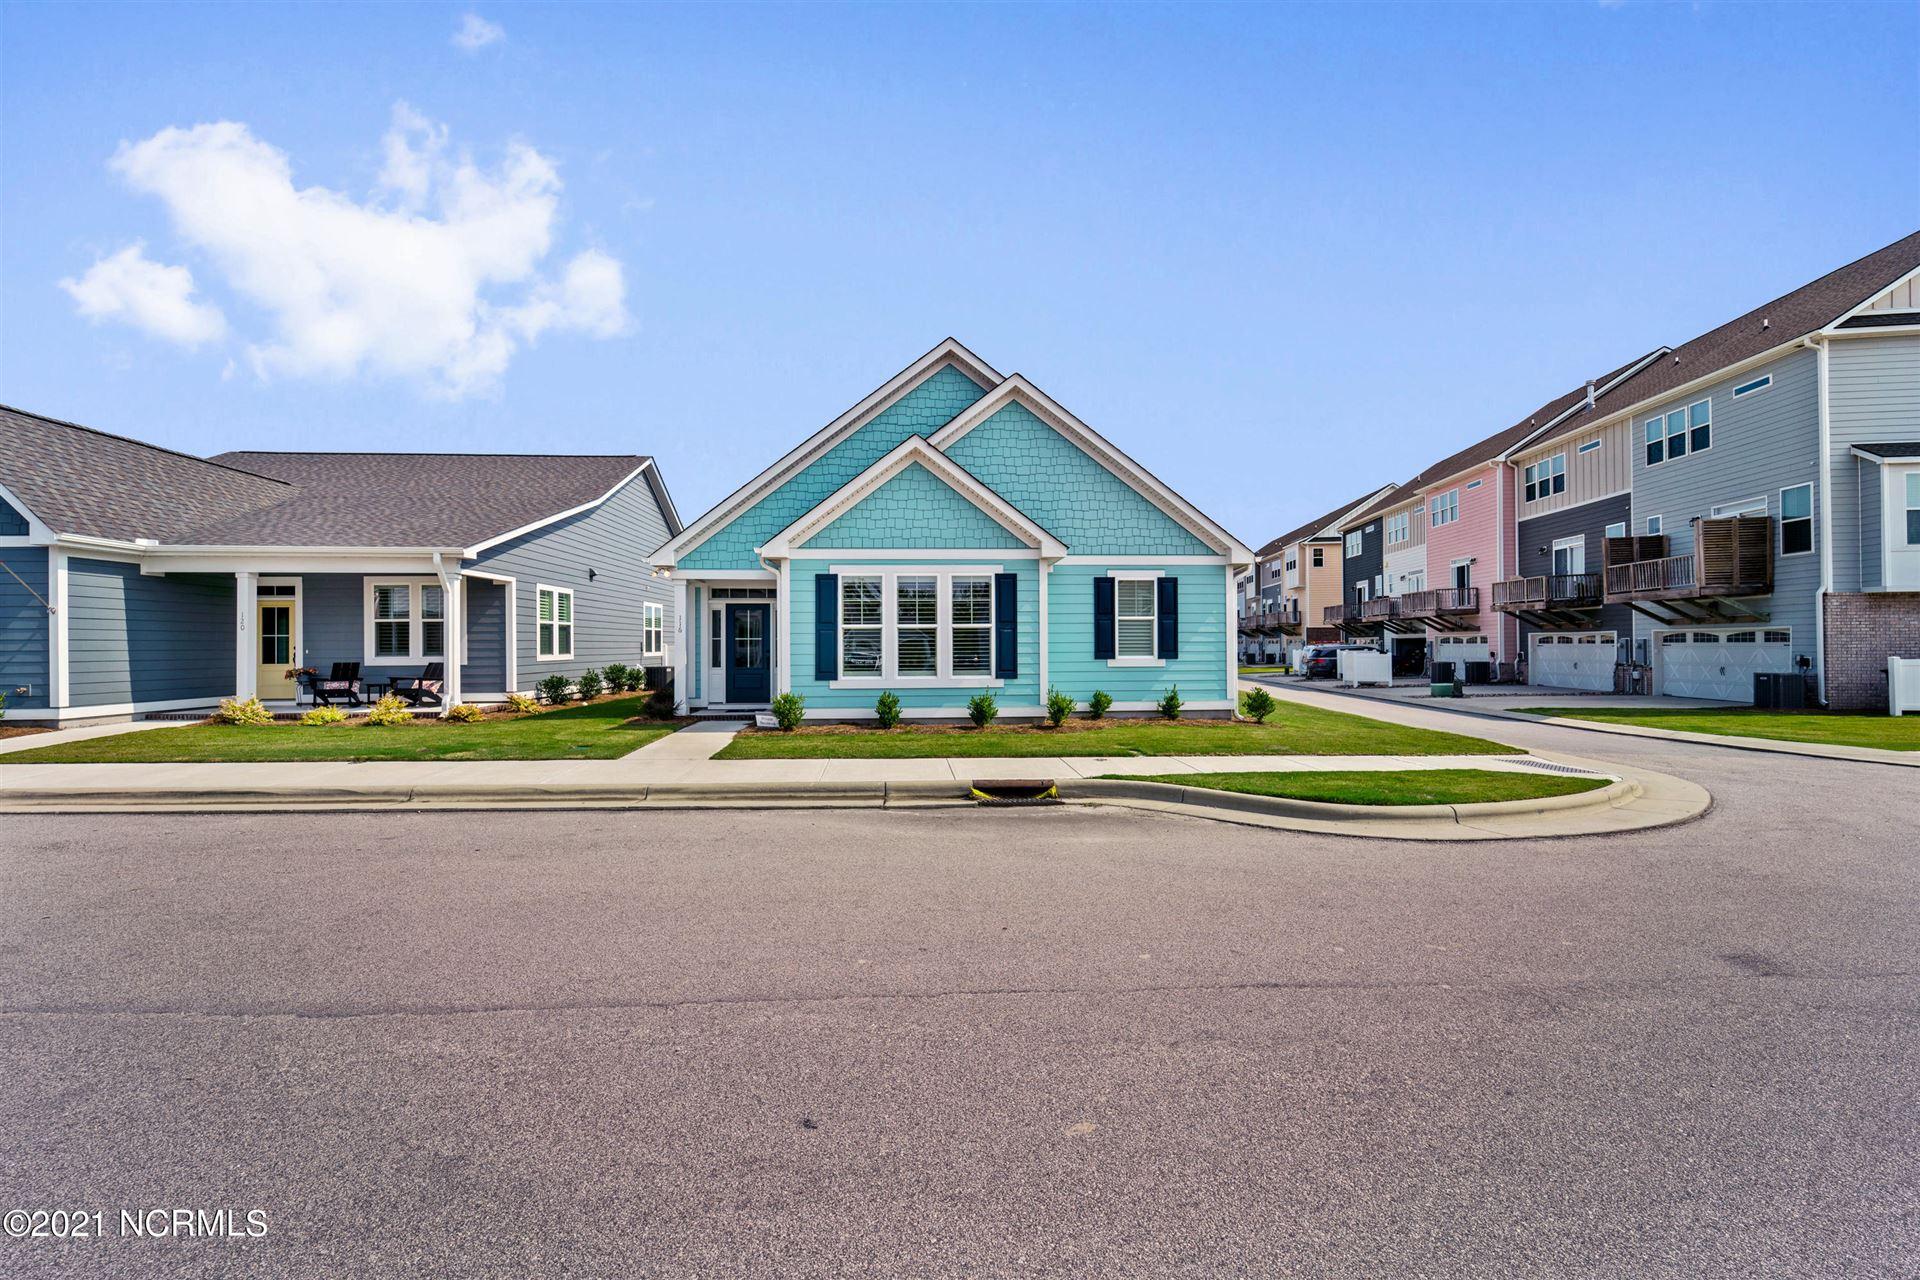 Photo of 116 Gray Duck Drive, Beaufort, NC 28516 (MLS # 100282978)